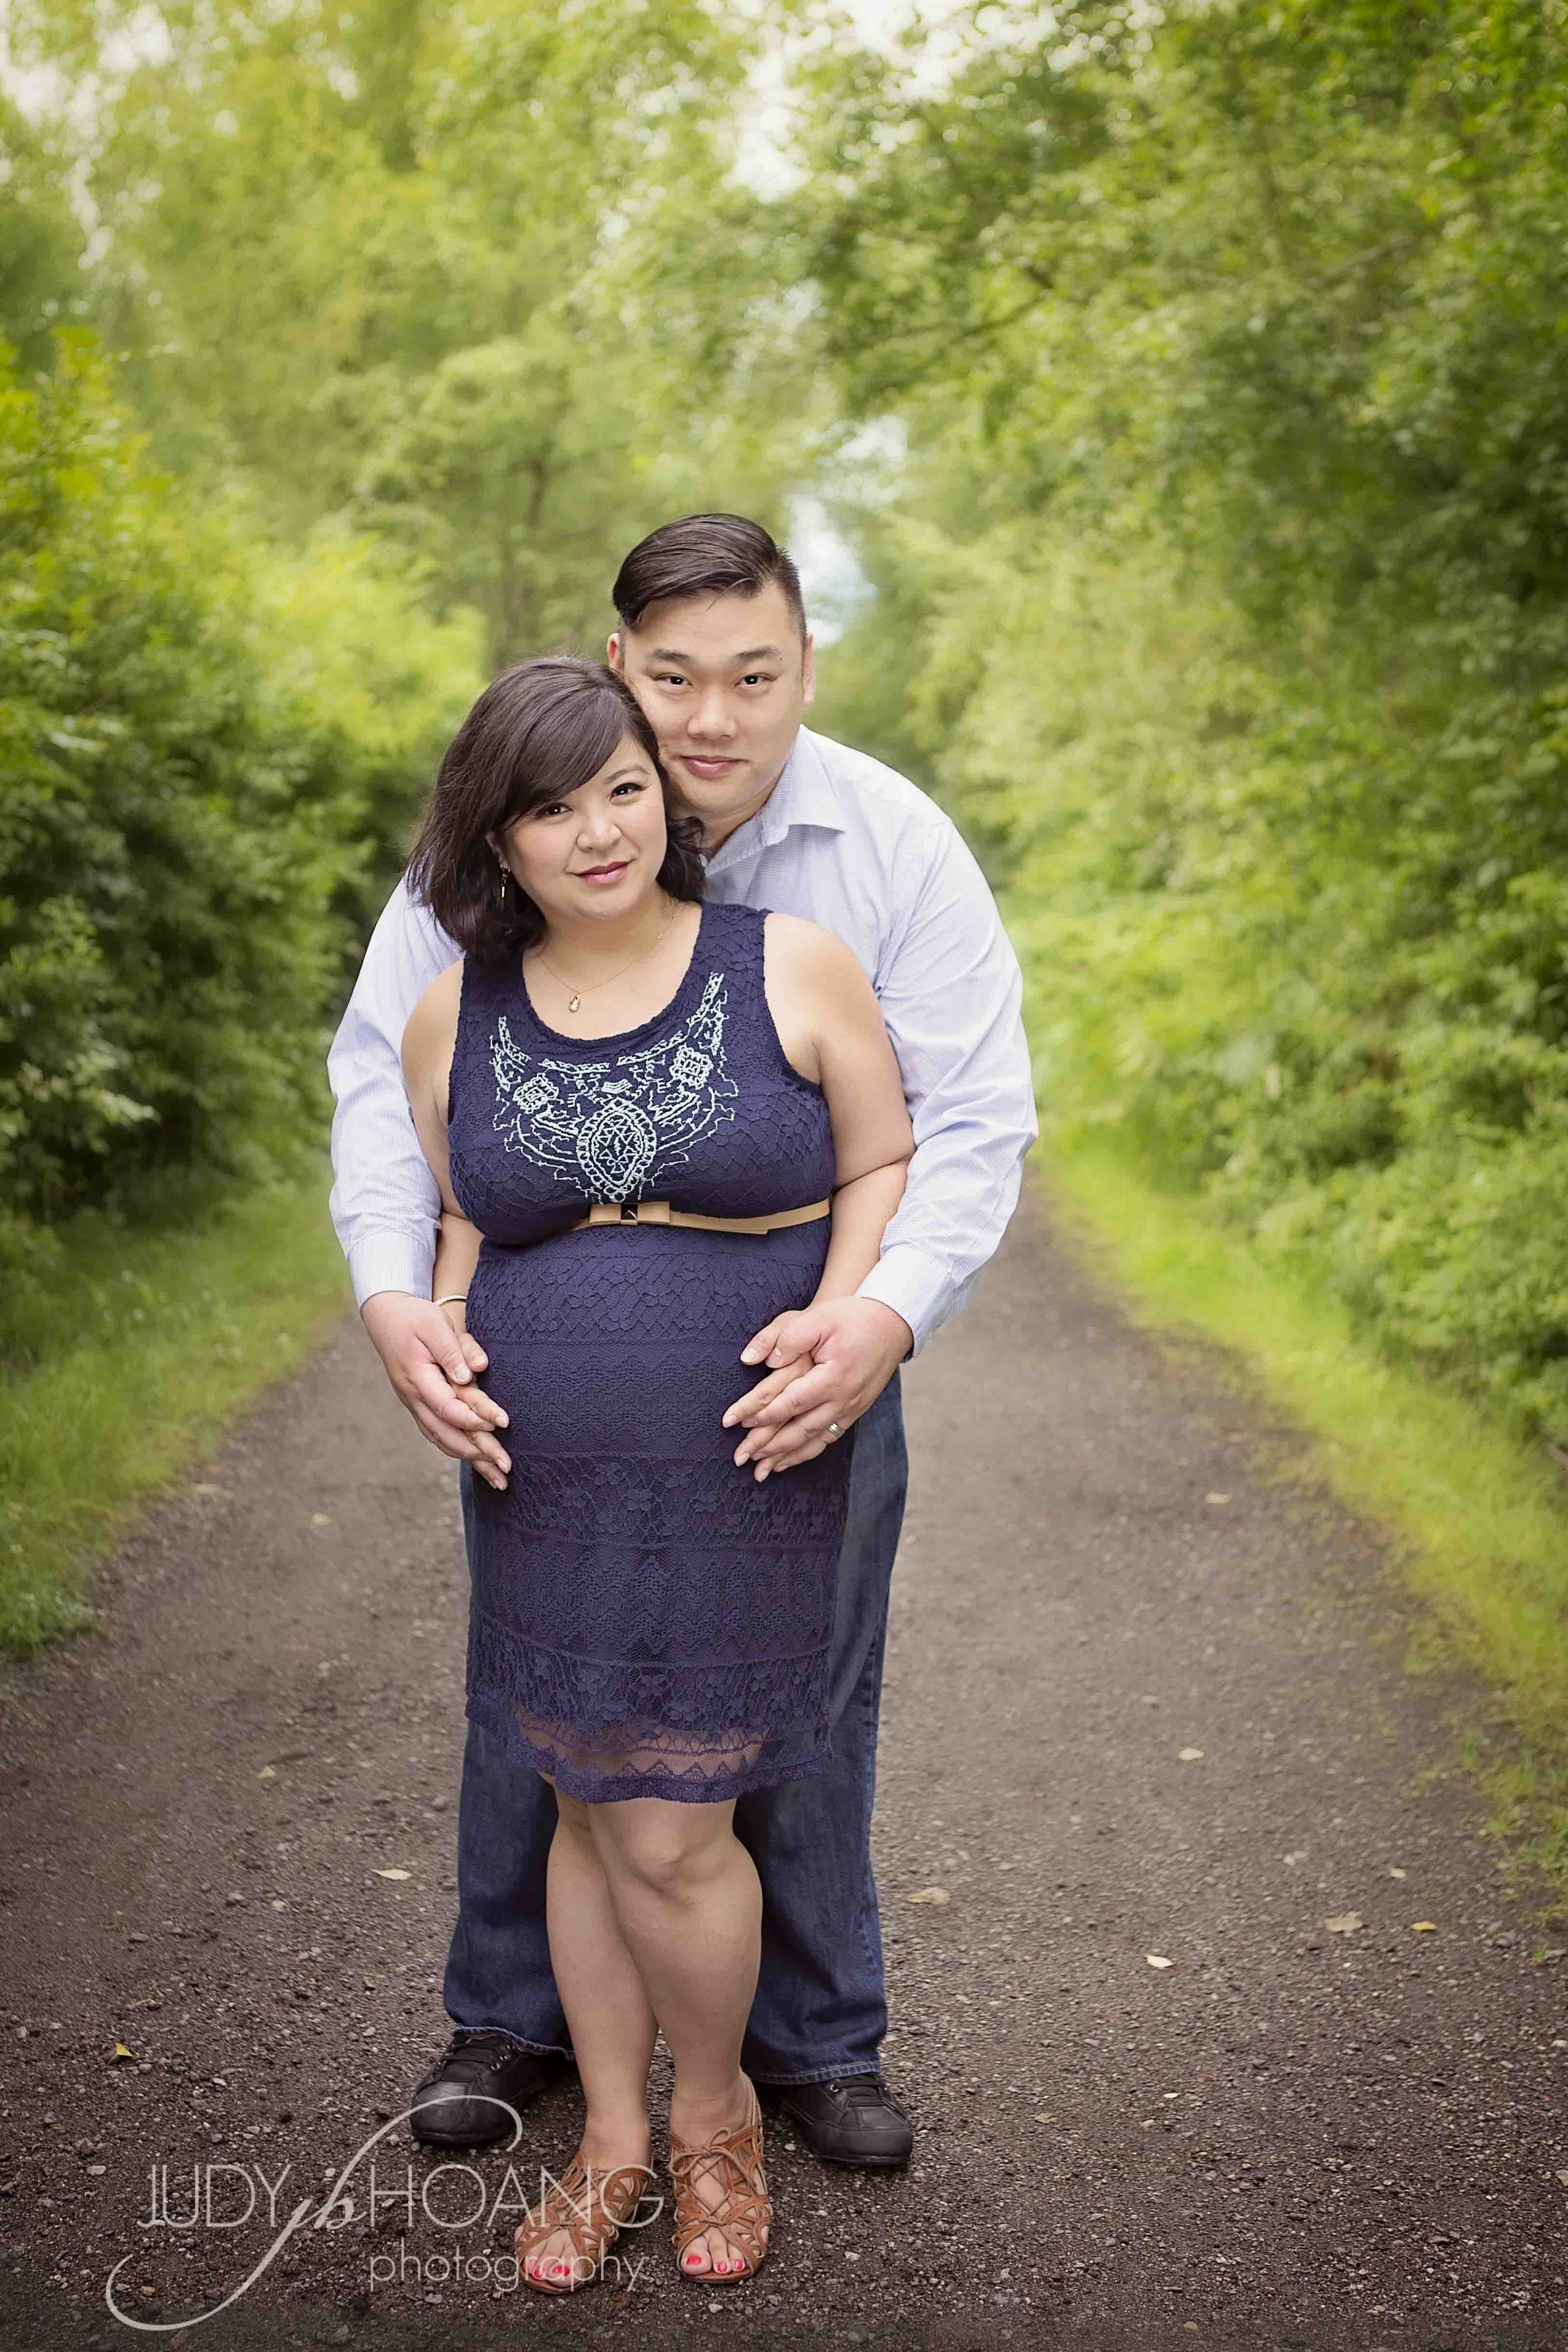 Judy Hoang Photography - VC Maternity Outdoors-1.jpg